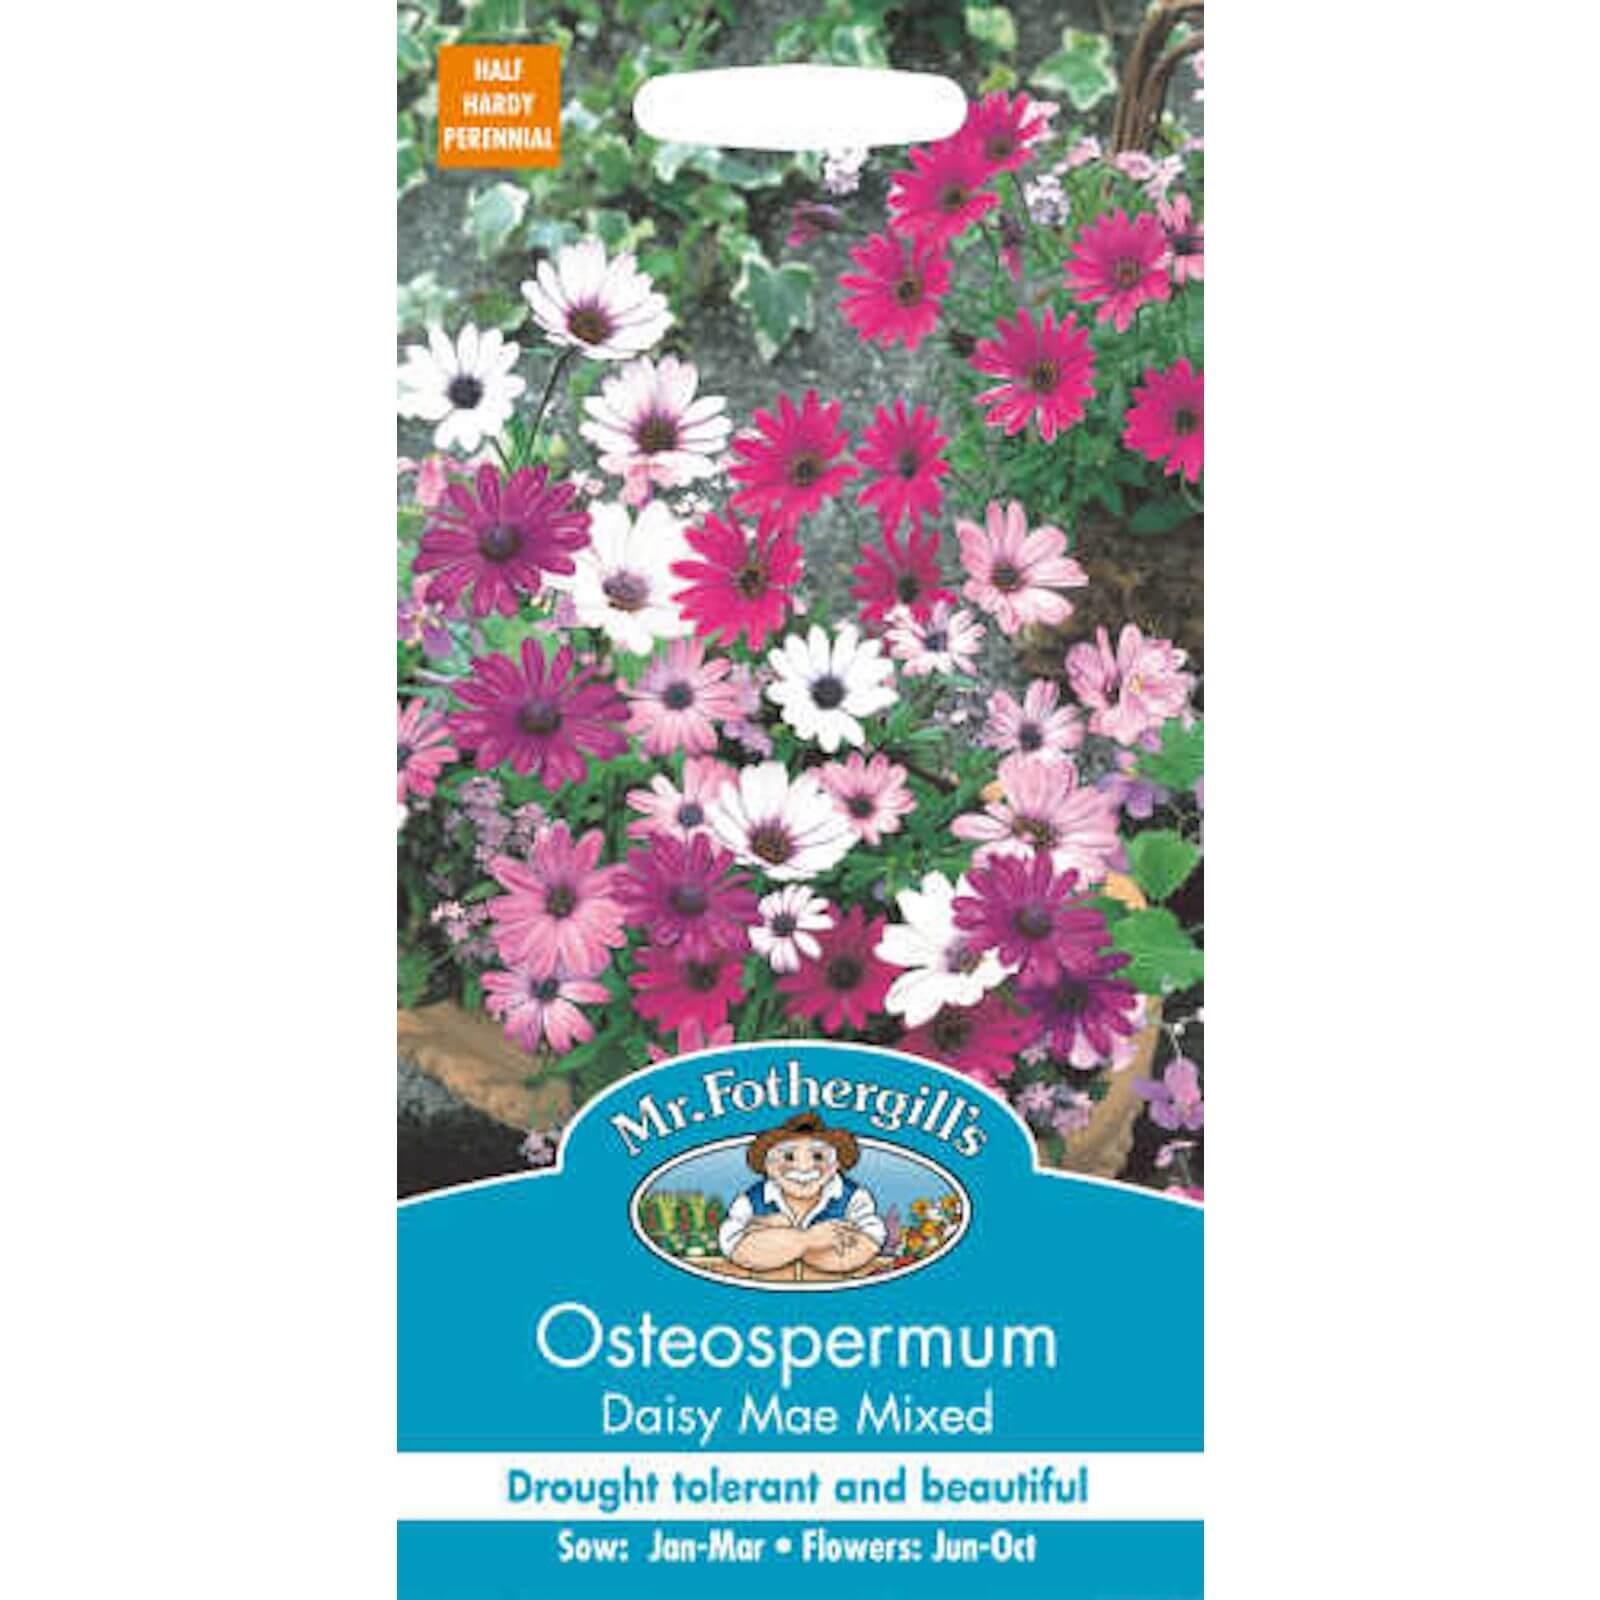 Mr. Fothergill's Osteospermum Daisy-Mae Mixed (Osteospermum Ecklonis) Seeds